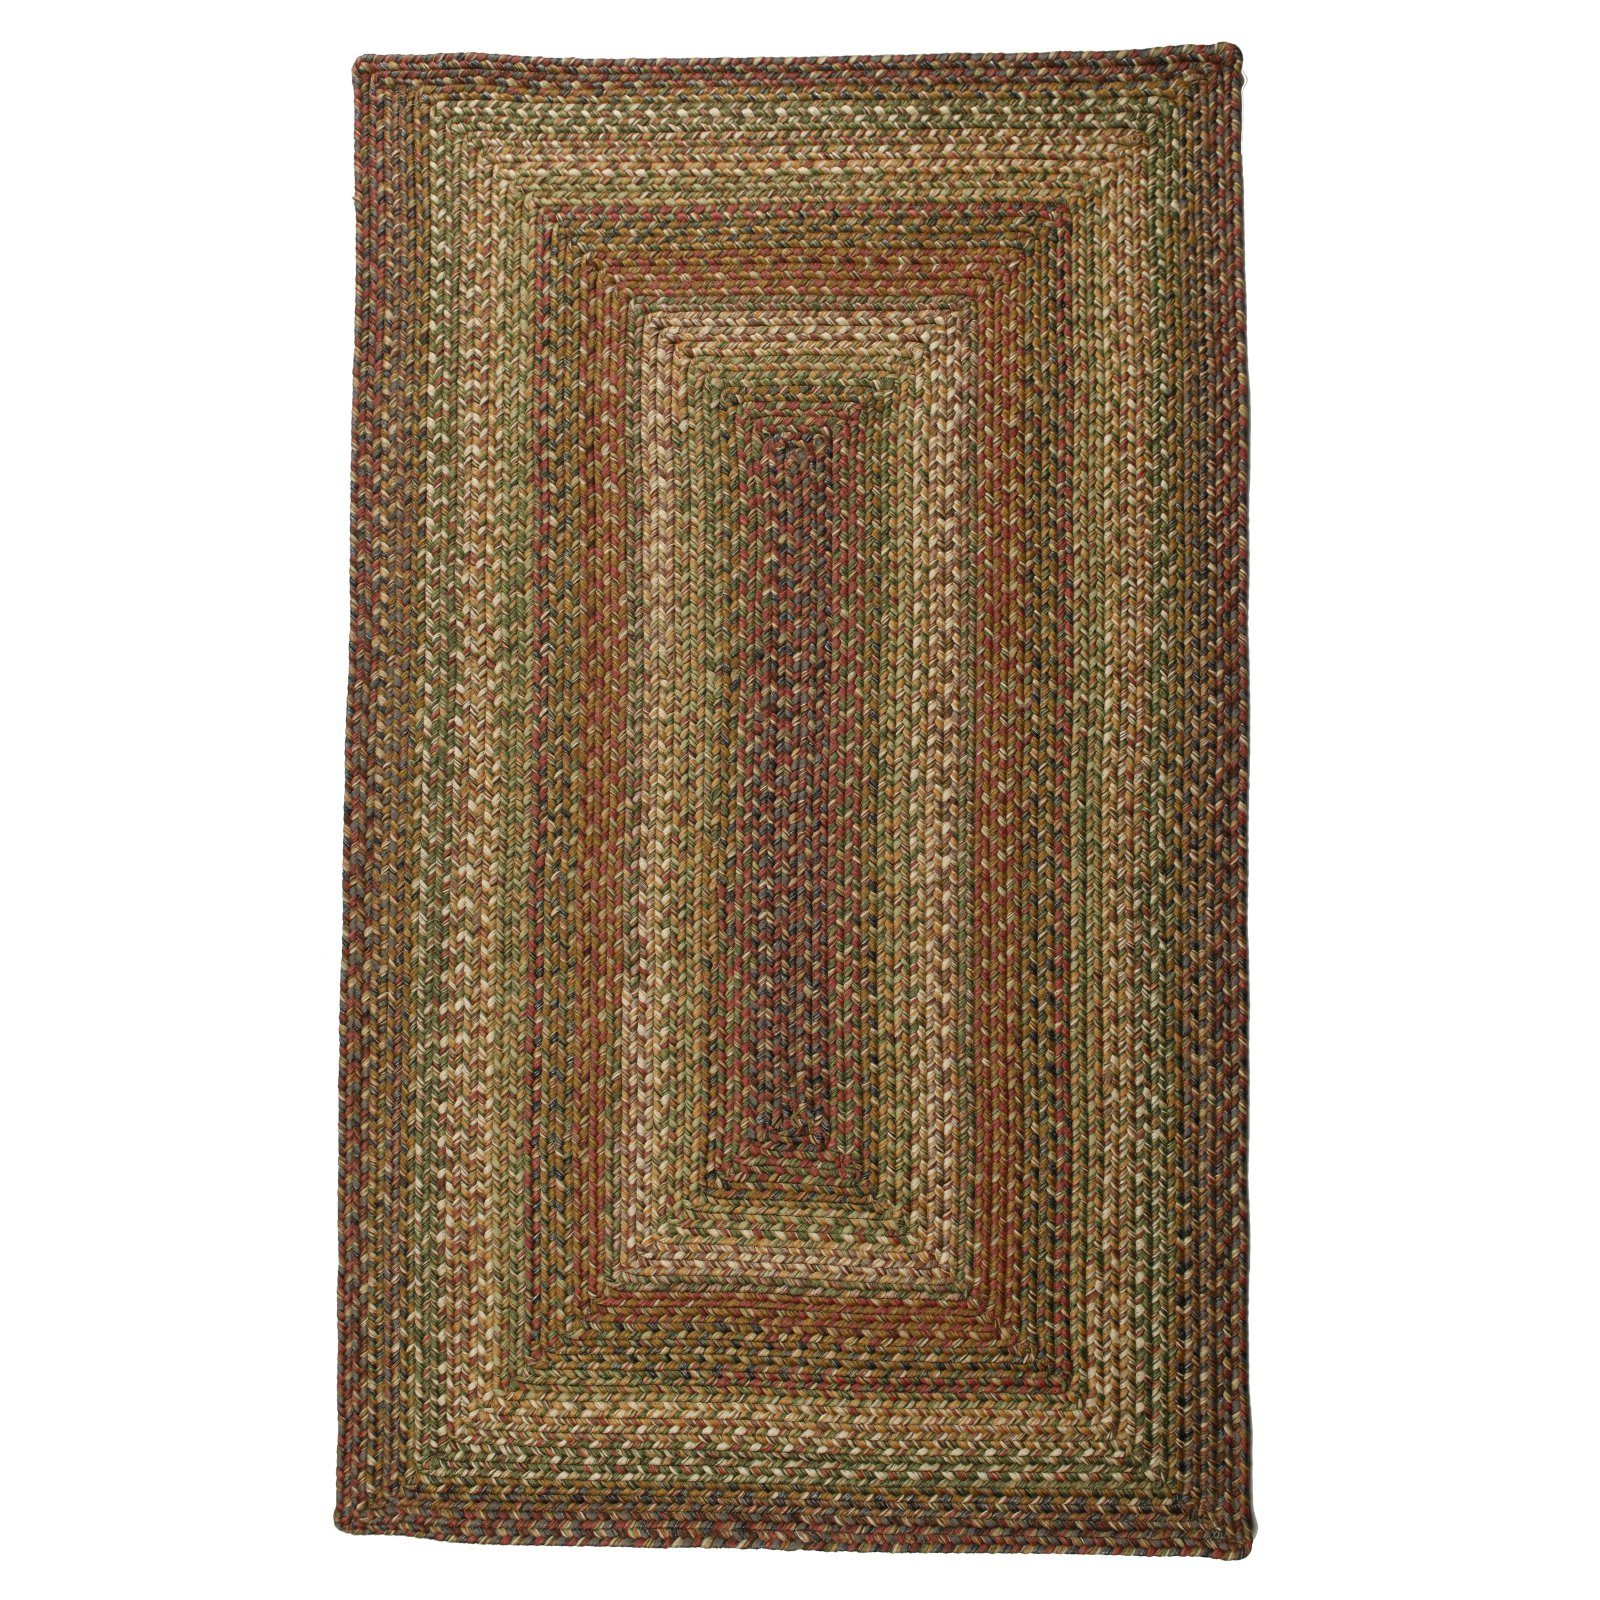 Homespice Decor Ultra Durable Rainforest Braided Rug